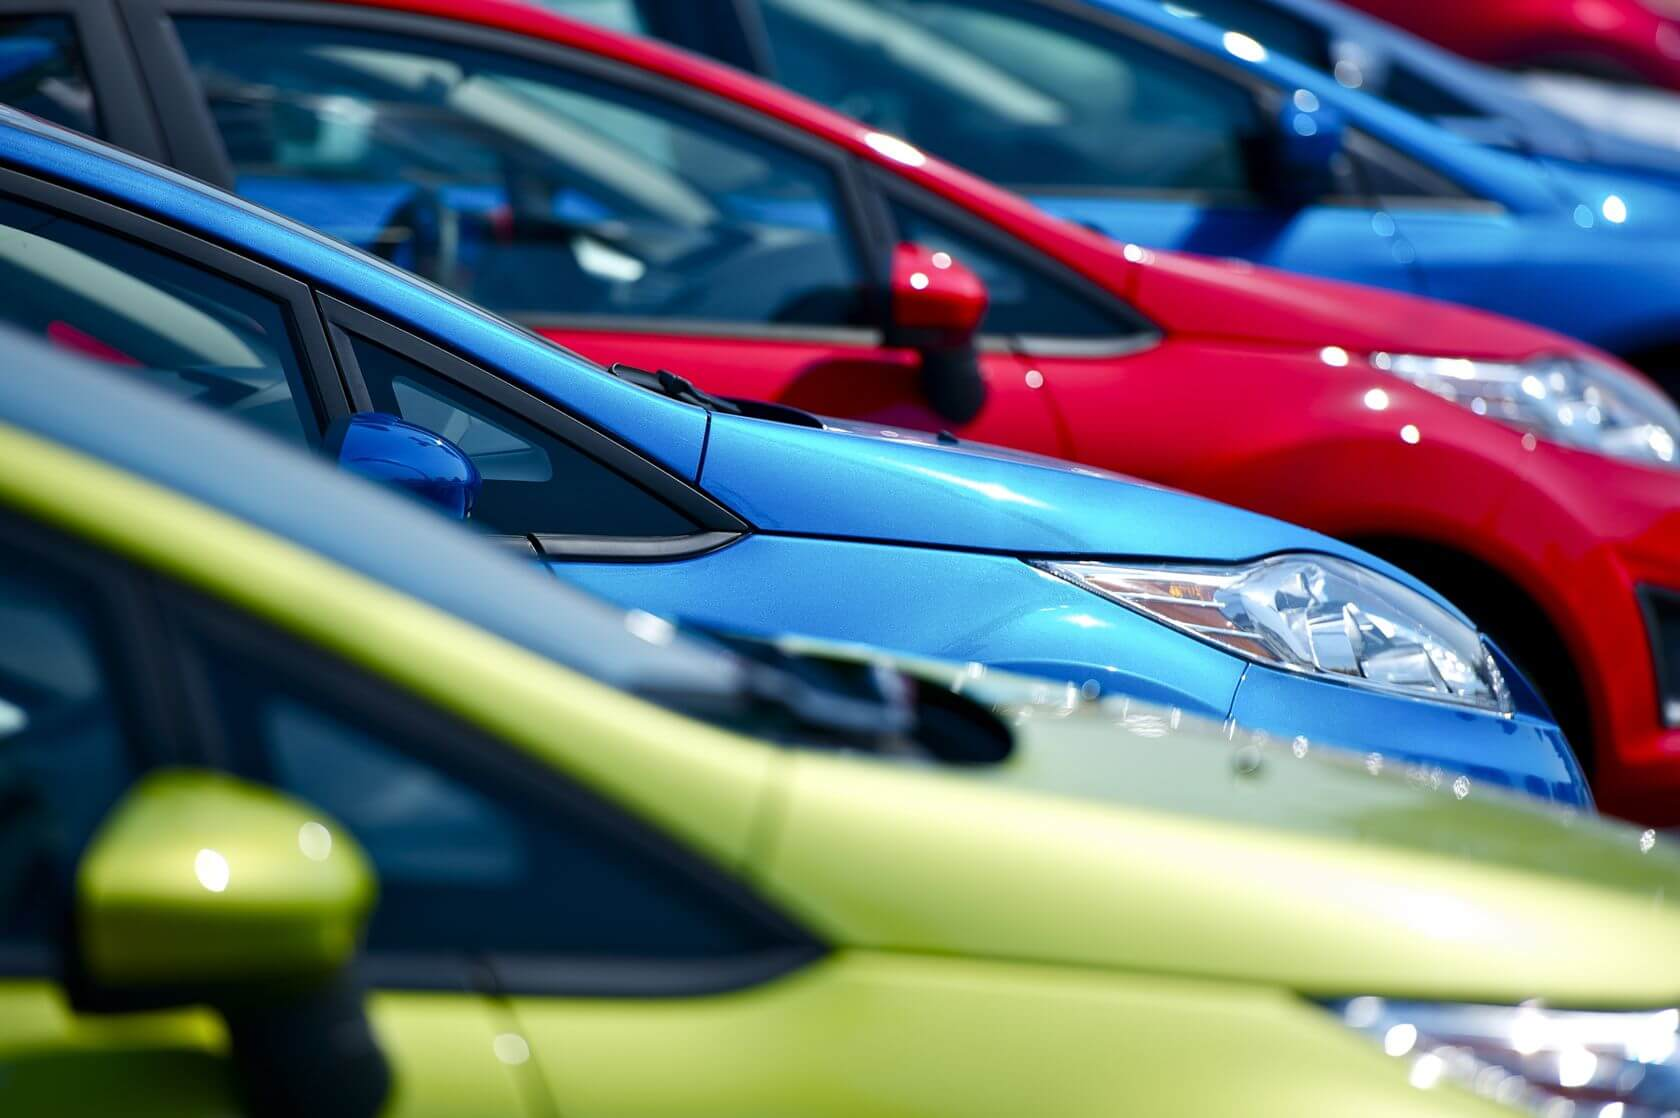 Row of new vehicles at a dealership